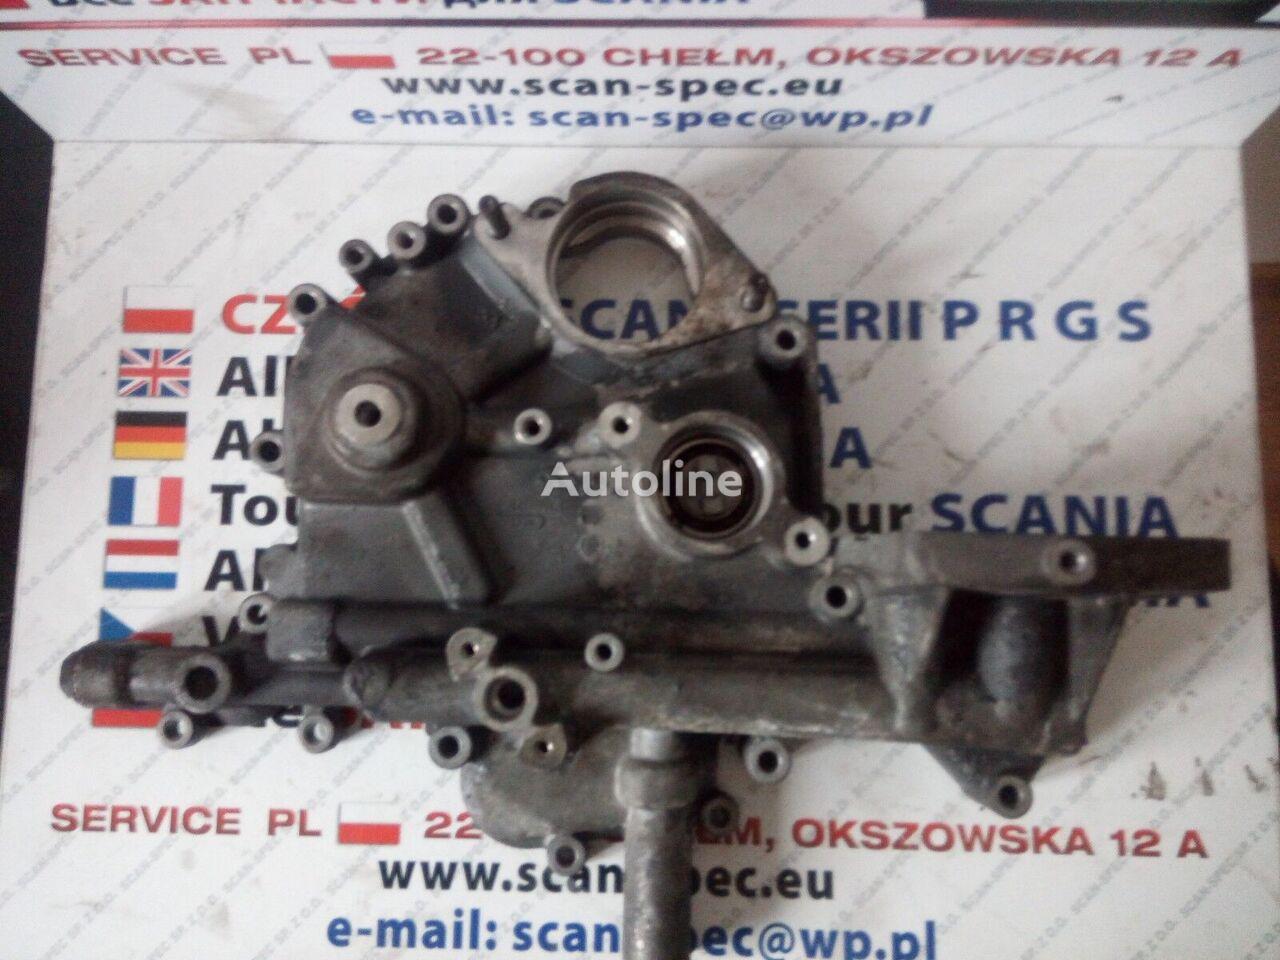 Pokrywa rozrządu V8 SCANIA DC 16 (1498204) other engine spare part for SCANIA Serie 4 R tractor unit